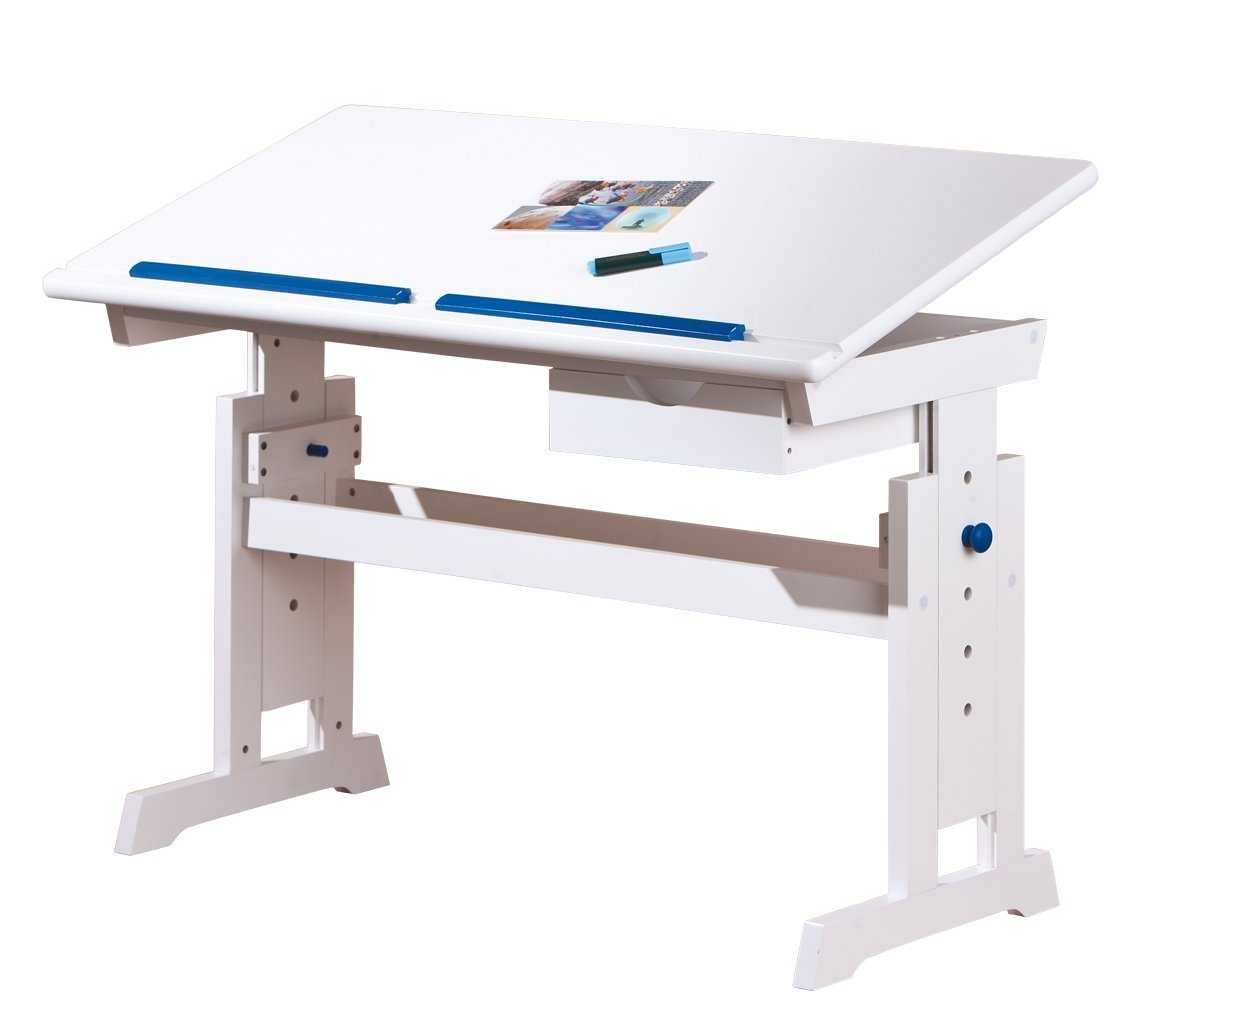 bureau inclinable bois massif blanc et bleu ou rose rubi. Black Bedroom Furniture Sets. Home Design Ideas